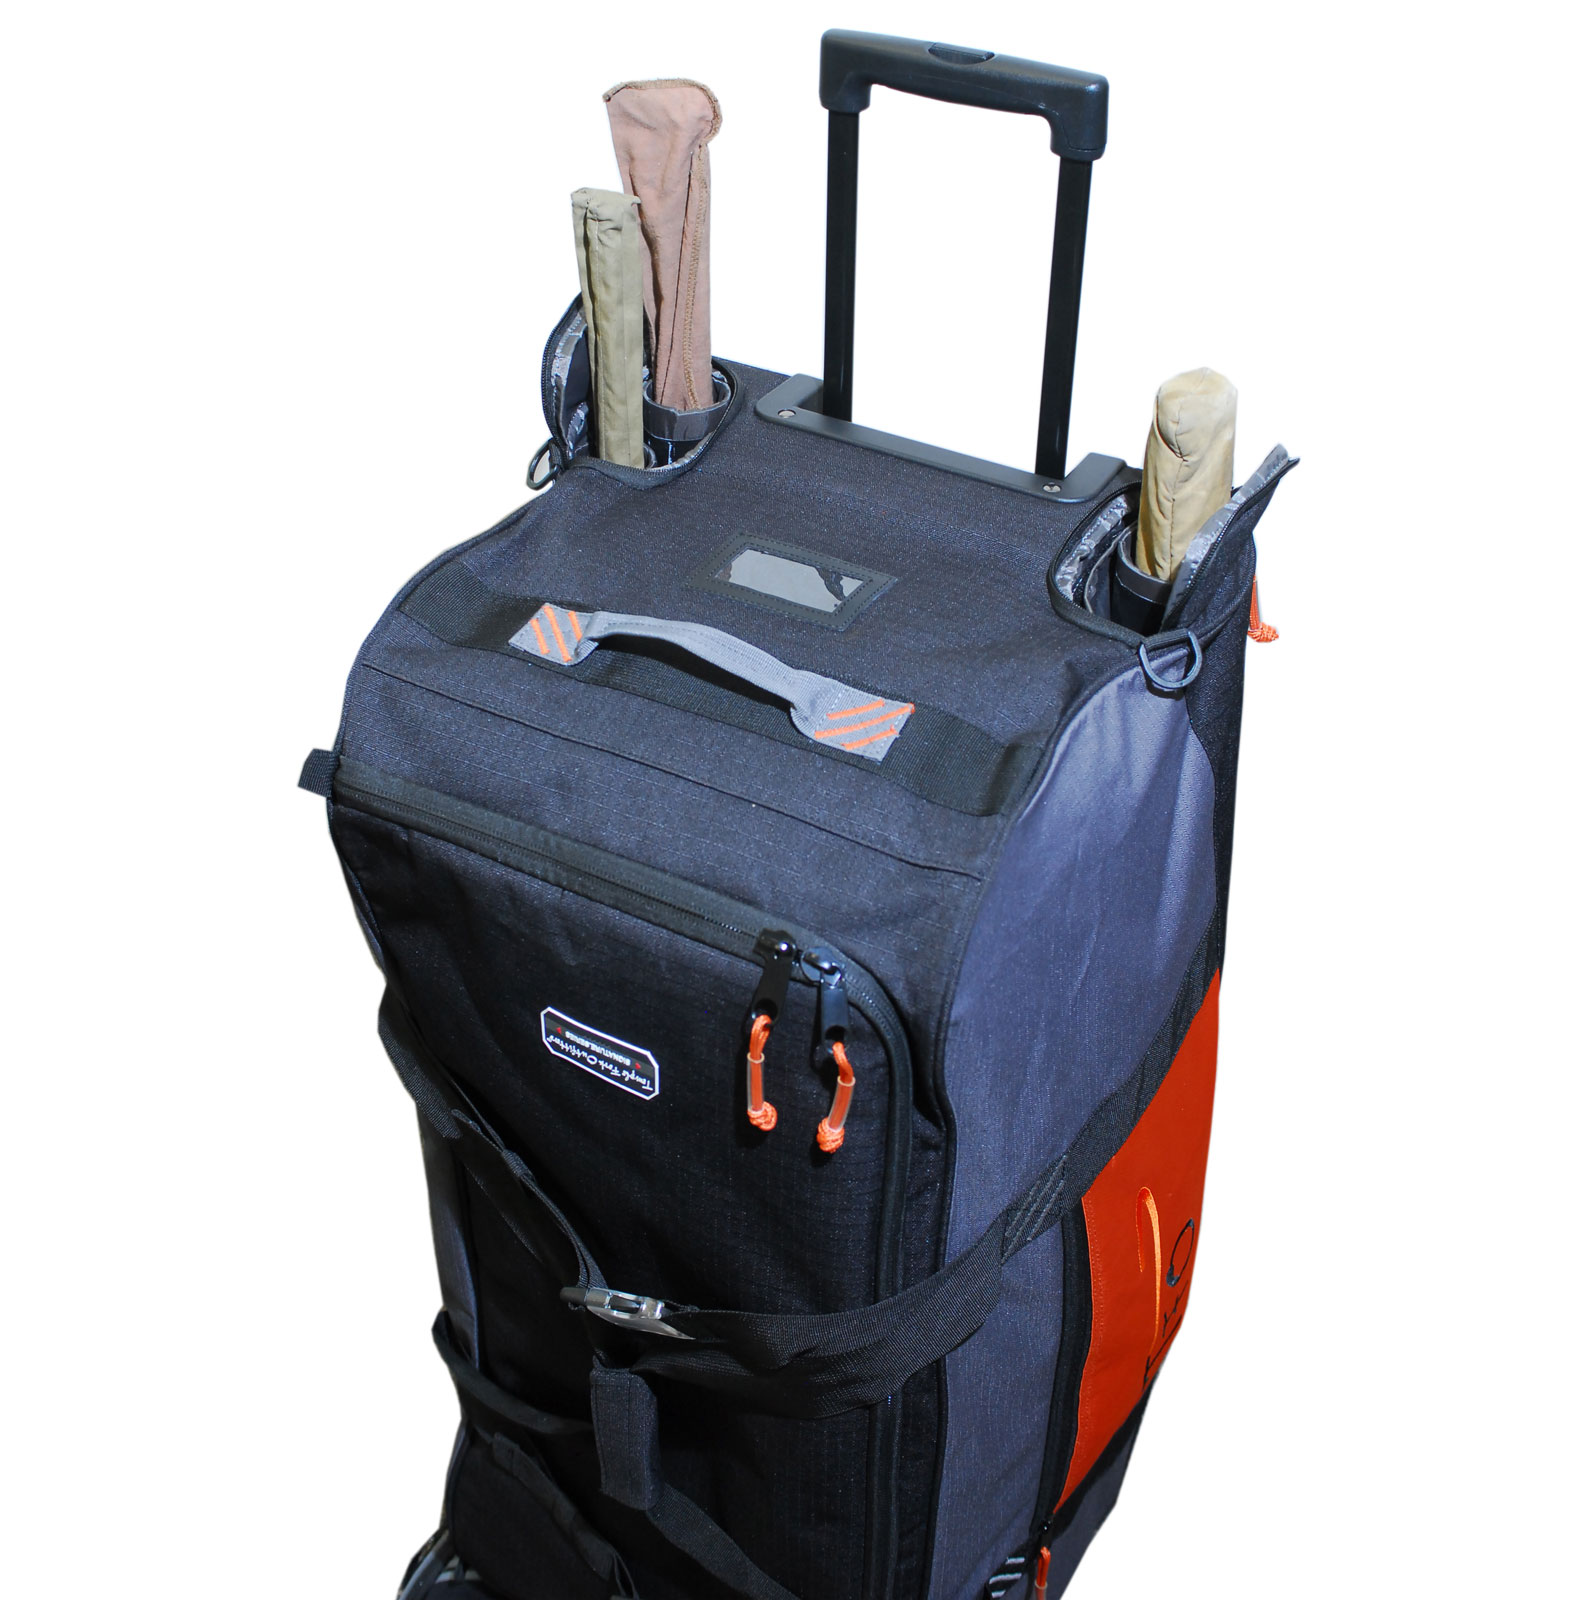 Tfo large rolling fly cargo bag fishing luggage wheeled for Fly fishing luggage